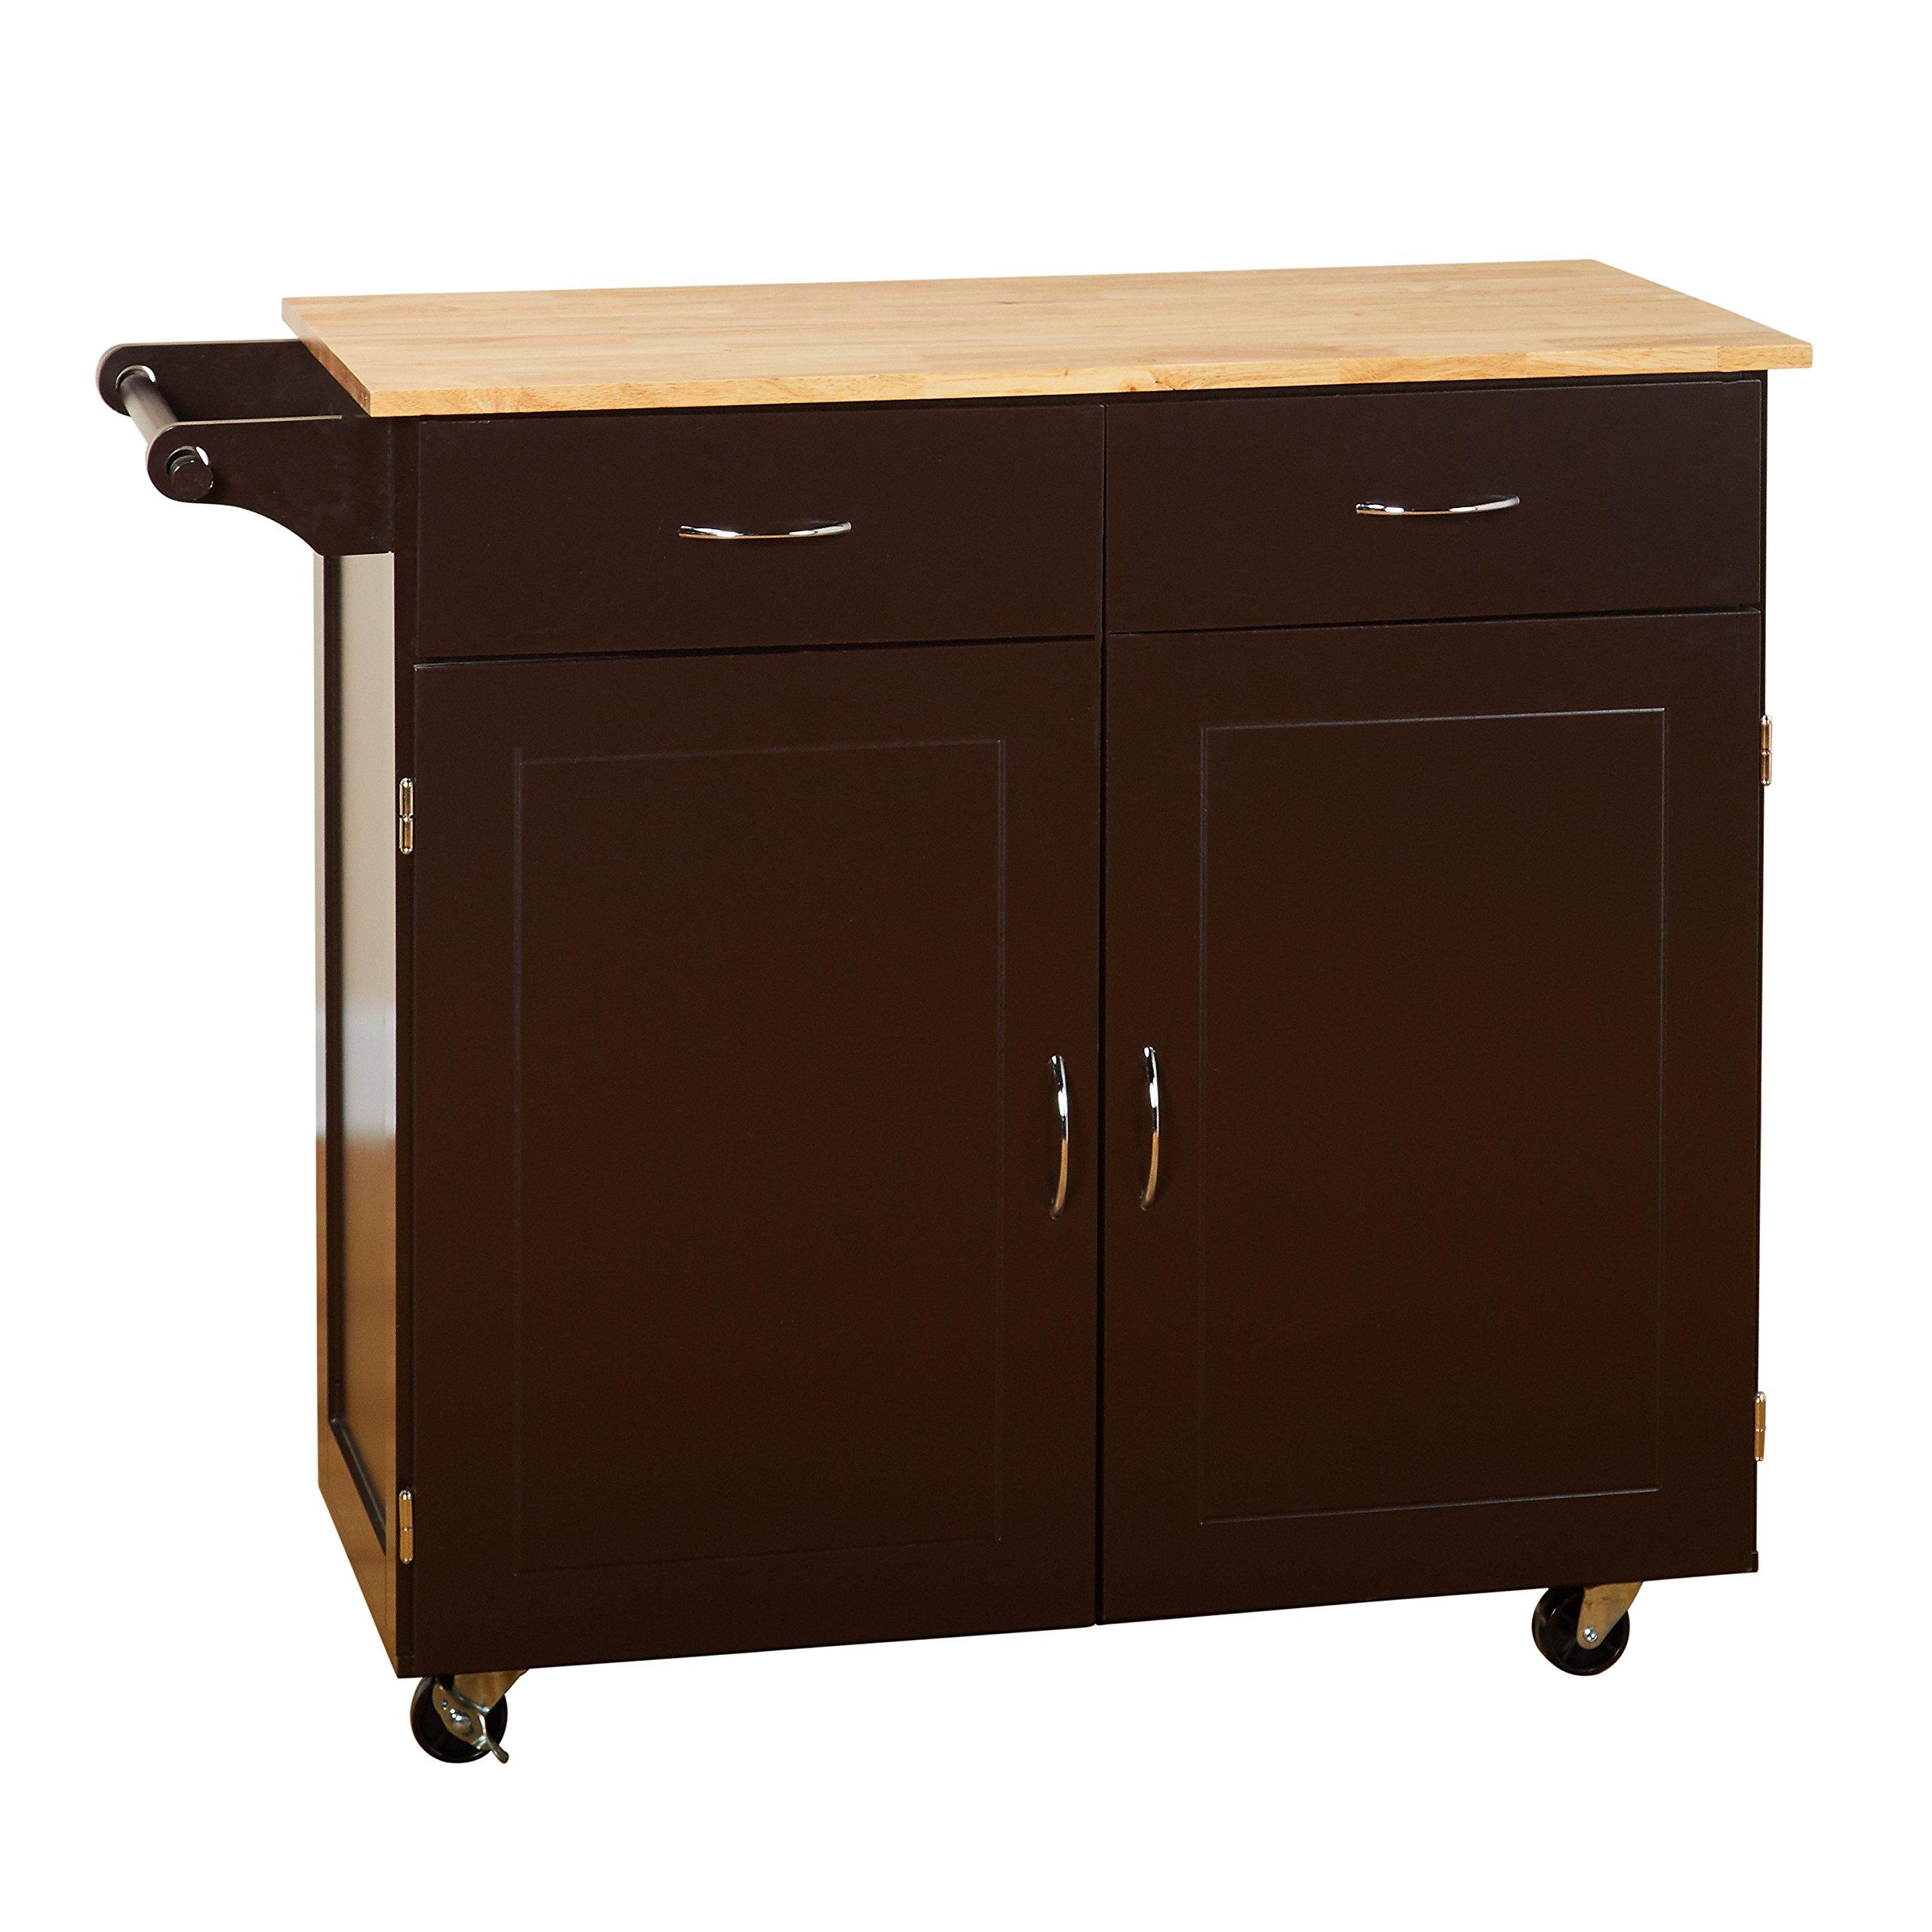 Target Marketing Systems 60046ESP Large Kitchen Cart, Espresso/Natural by Target Marketing Systems